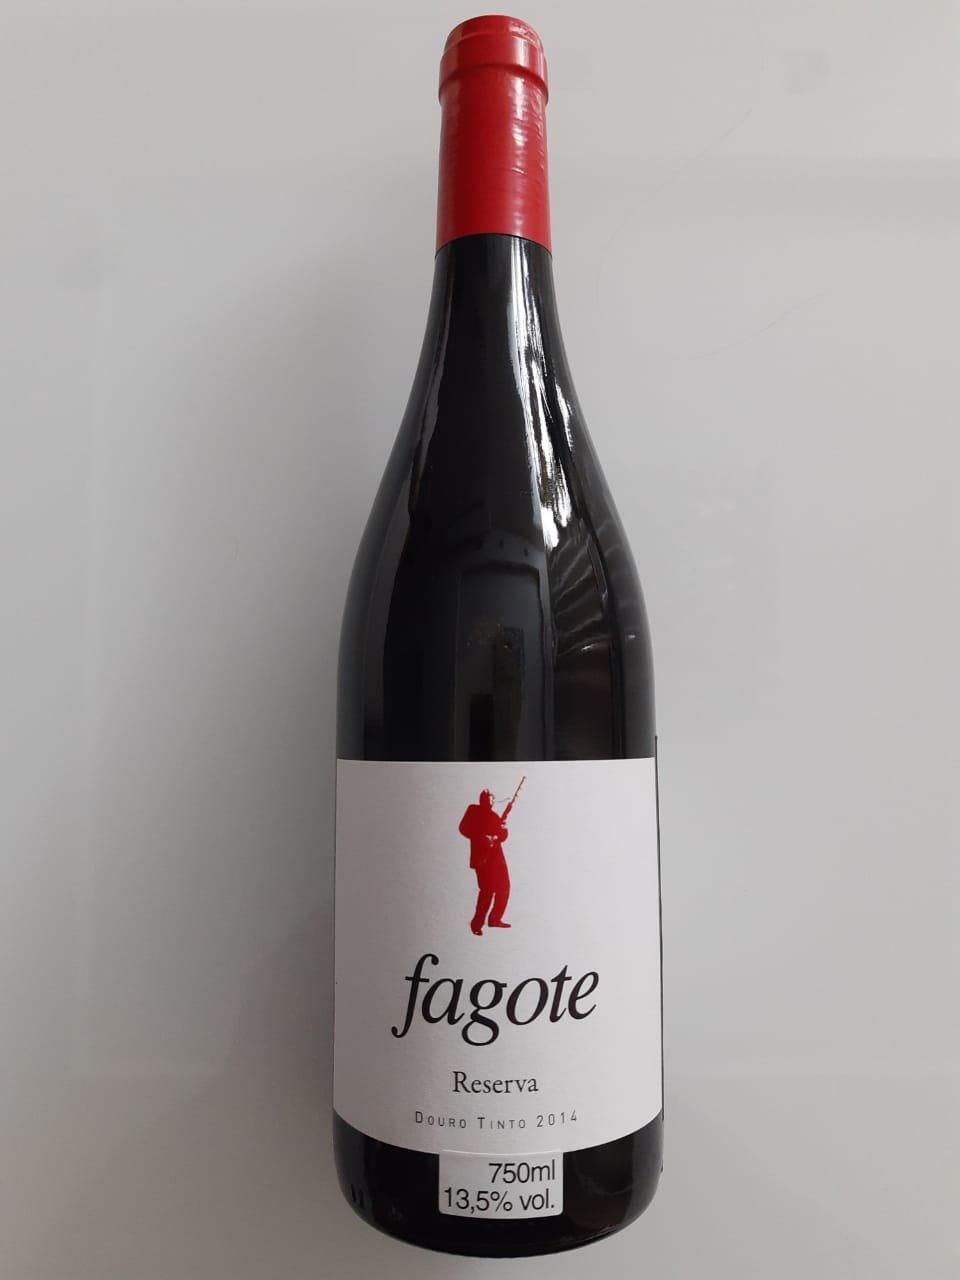 Vinho Fagote Reserva Tinto 750ml